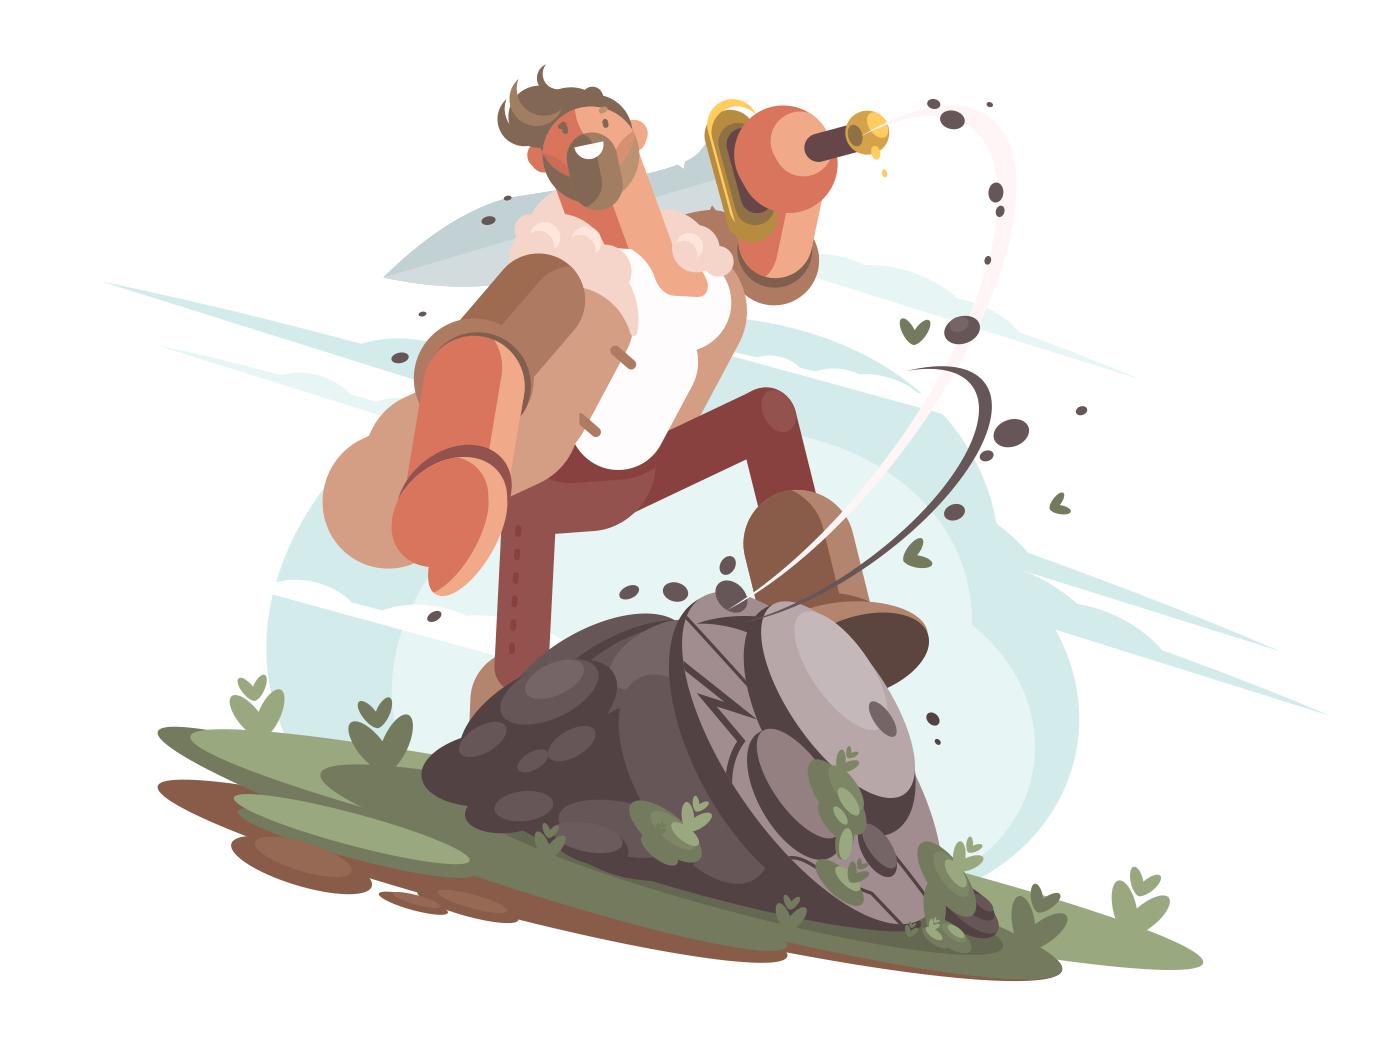 Brave warrior king arthur with sword in hand. Vector illustration